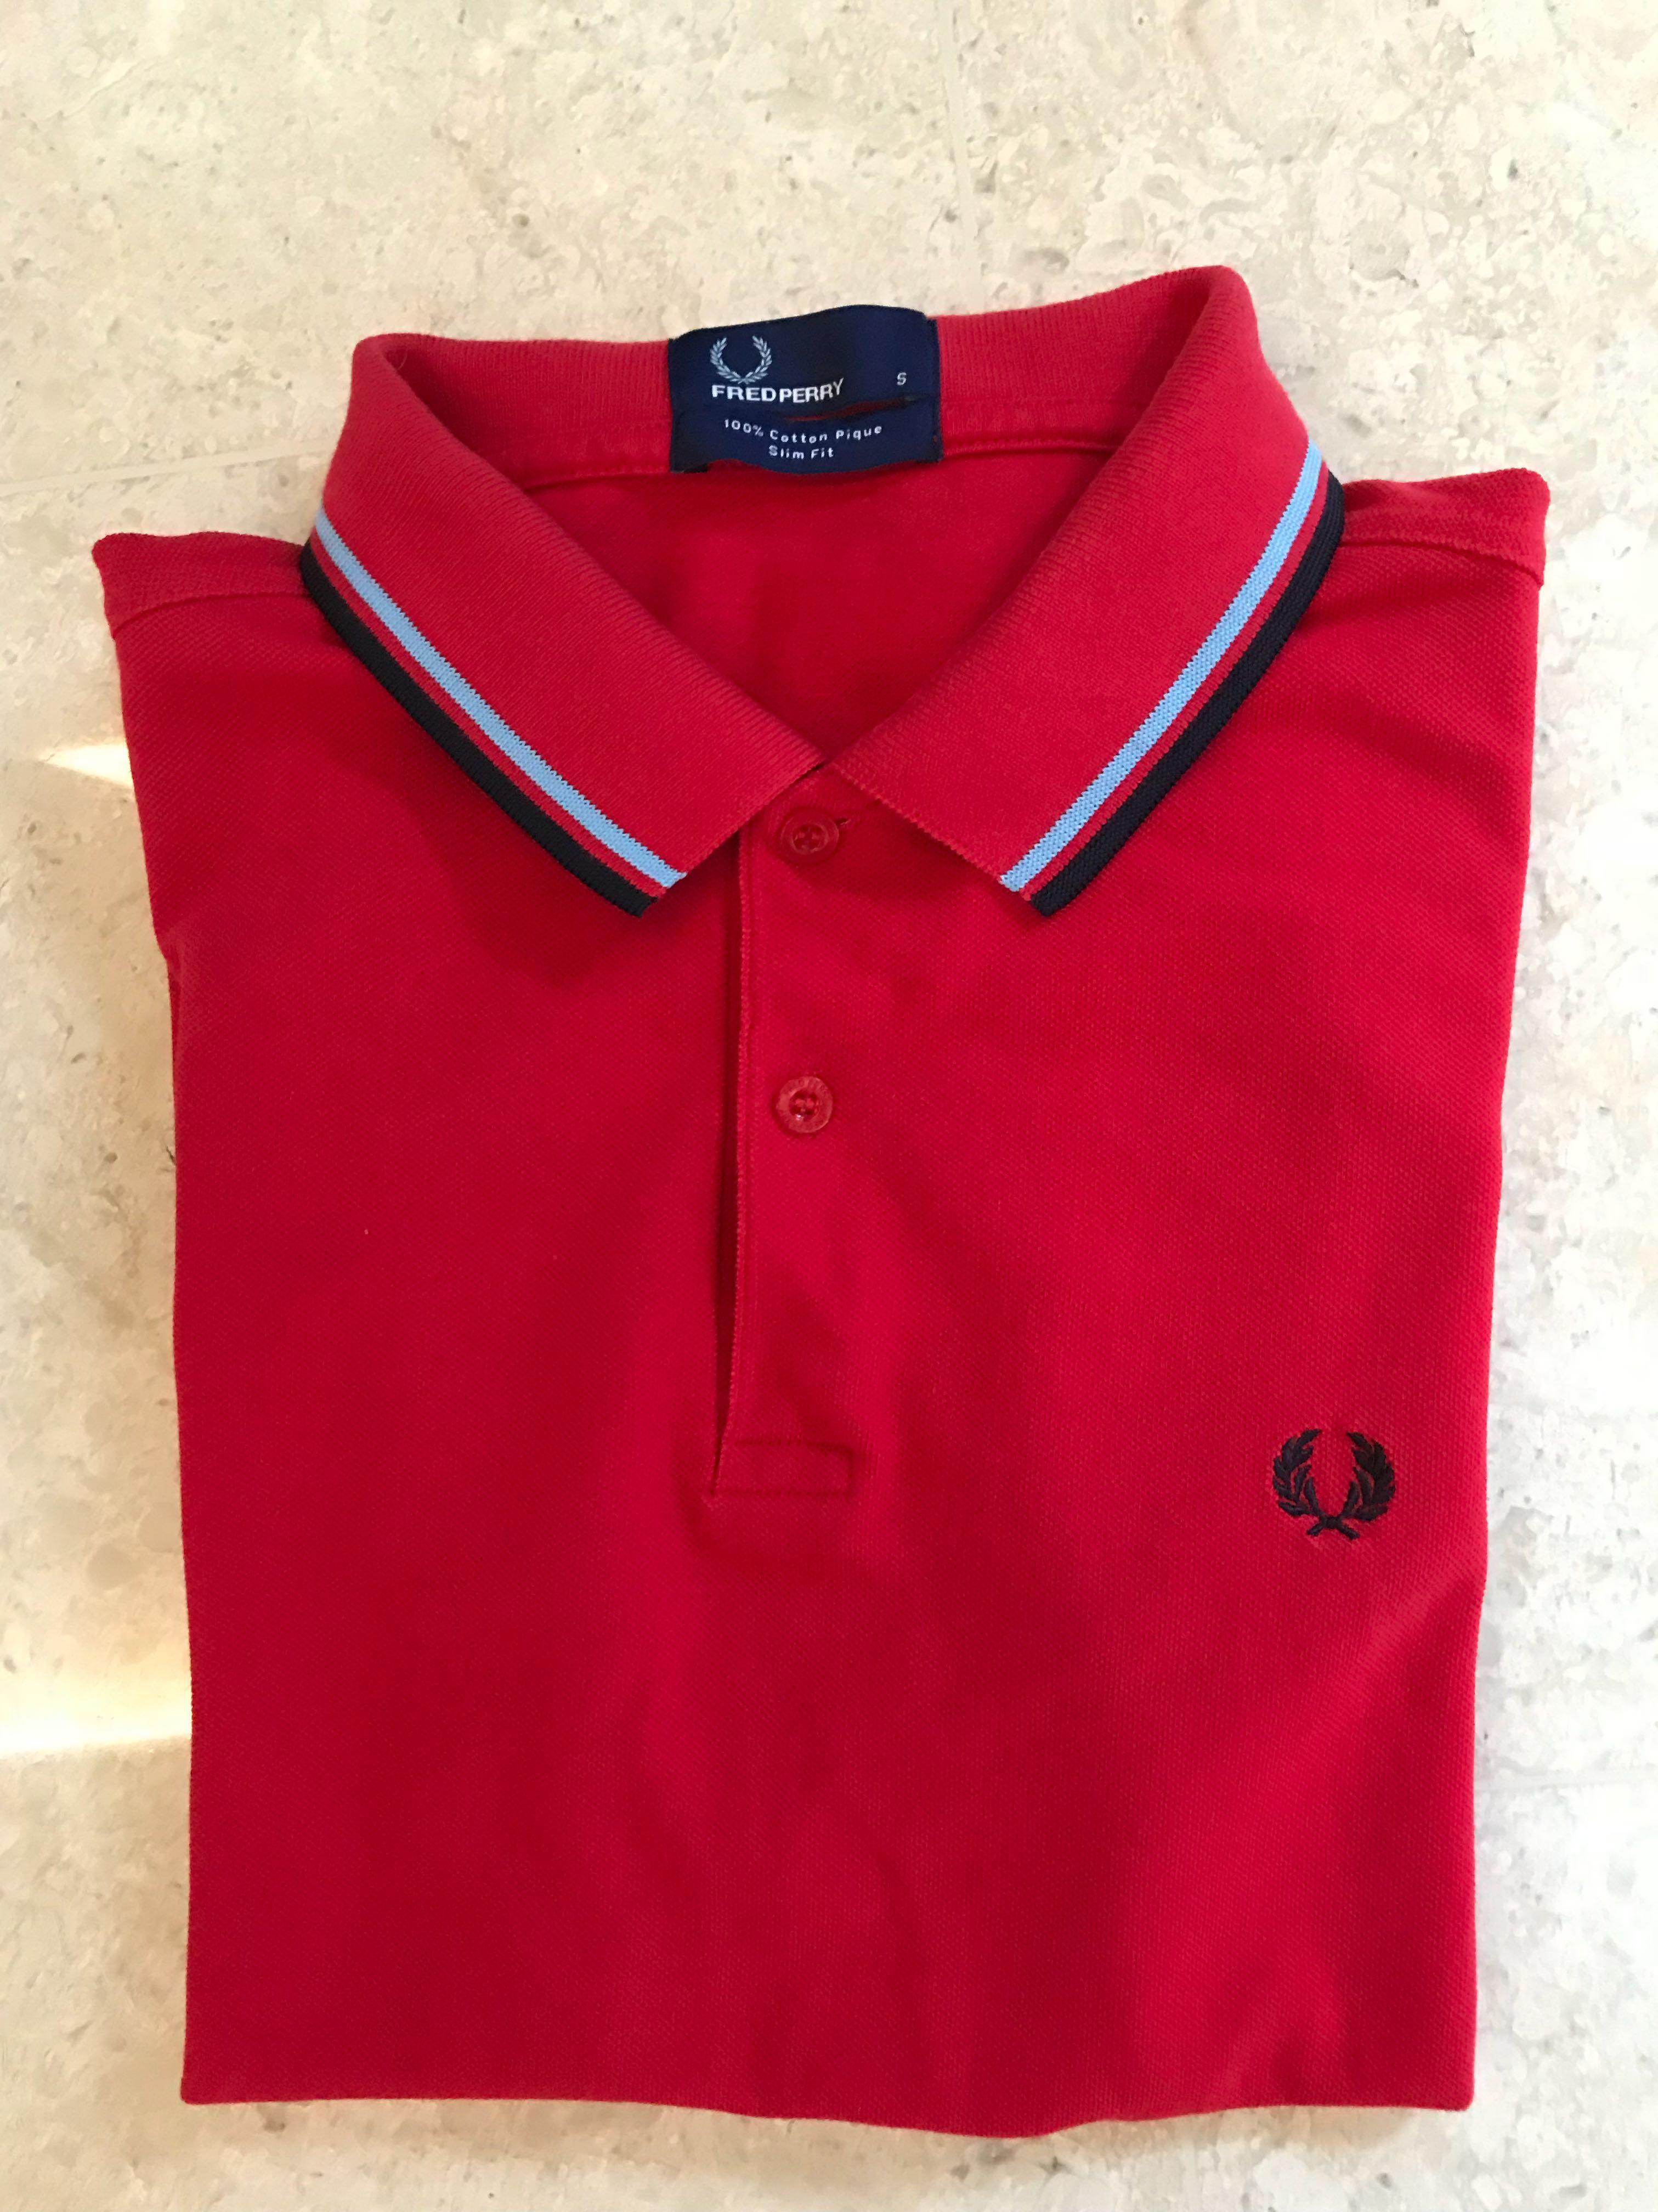 3ddf8e71 Fred Perry Polo Shirt Singapore Price